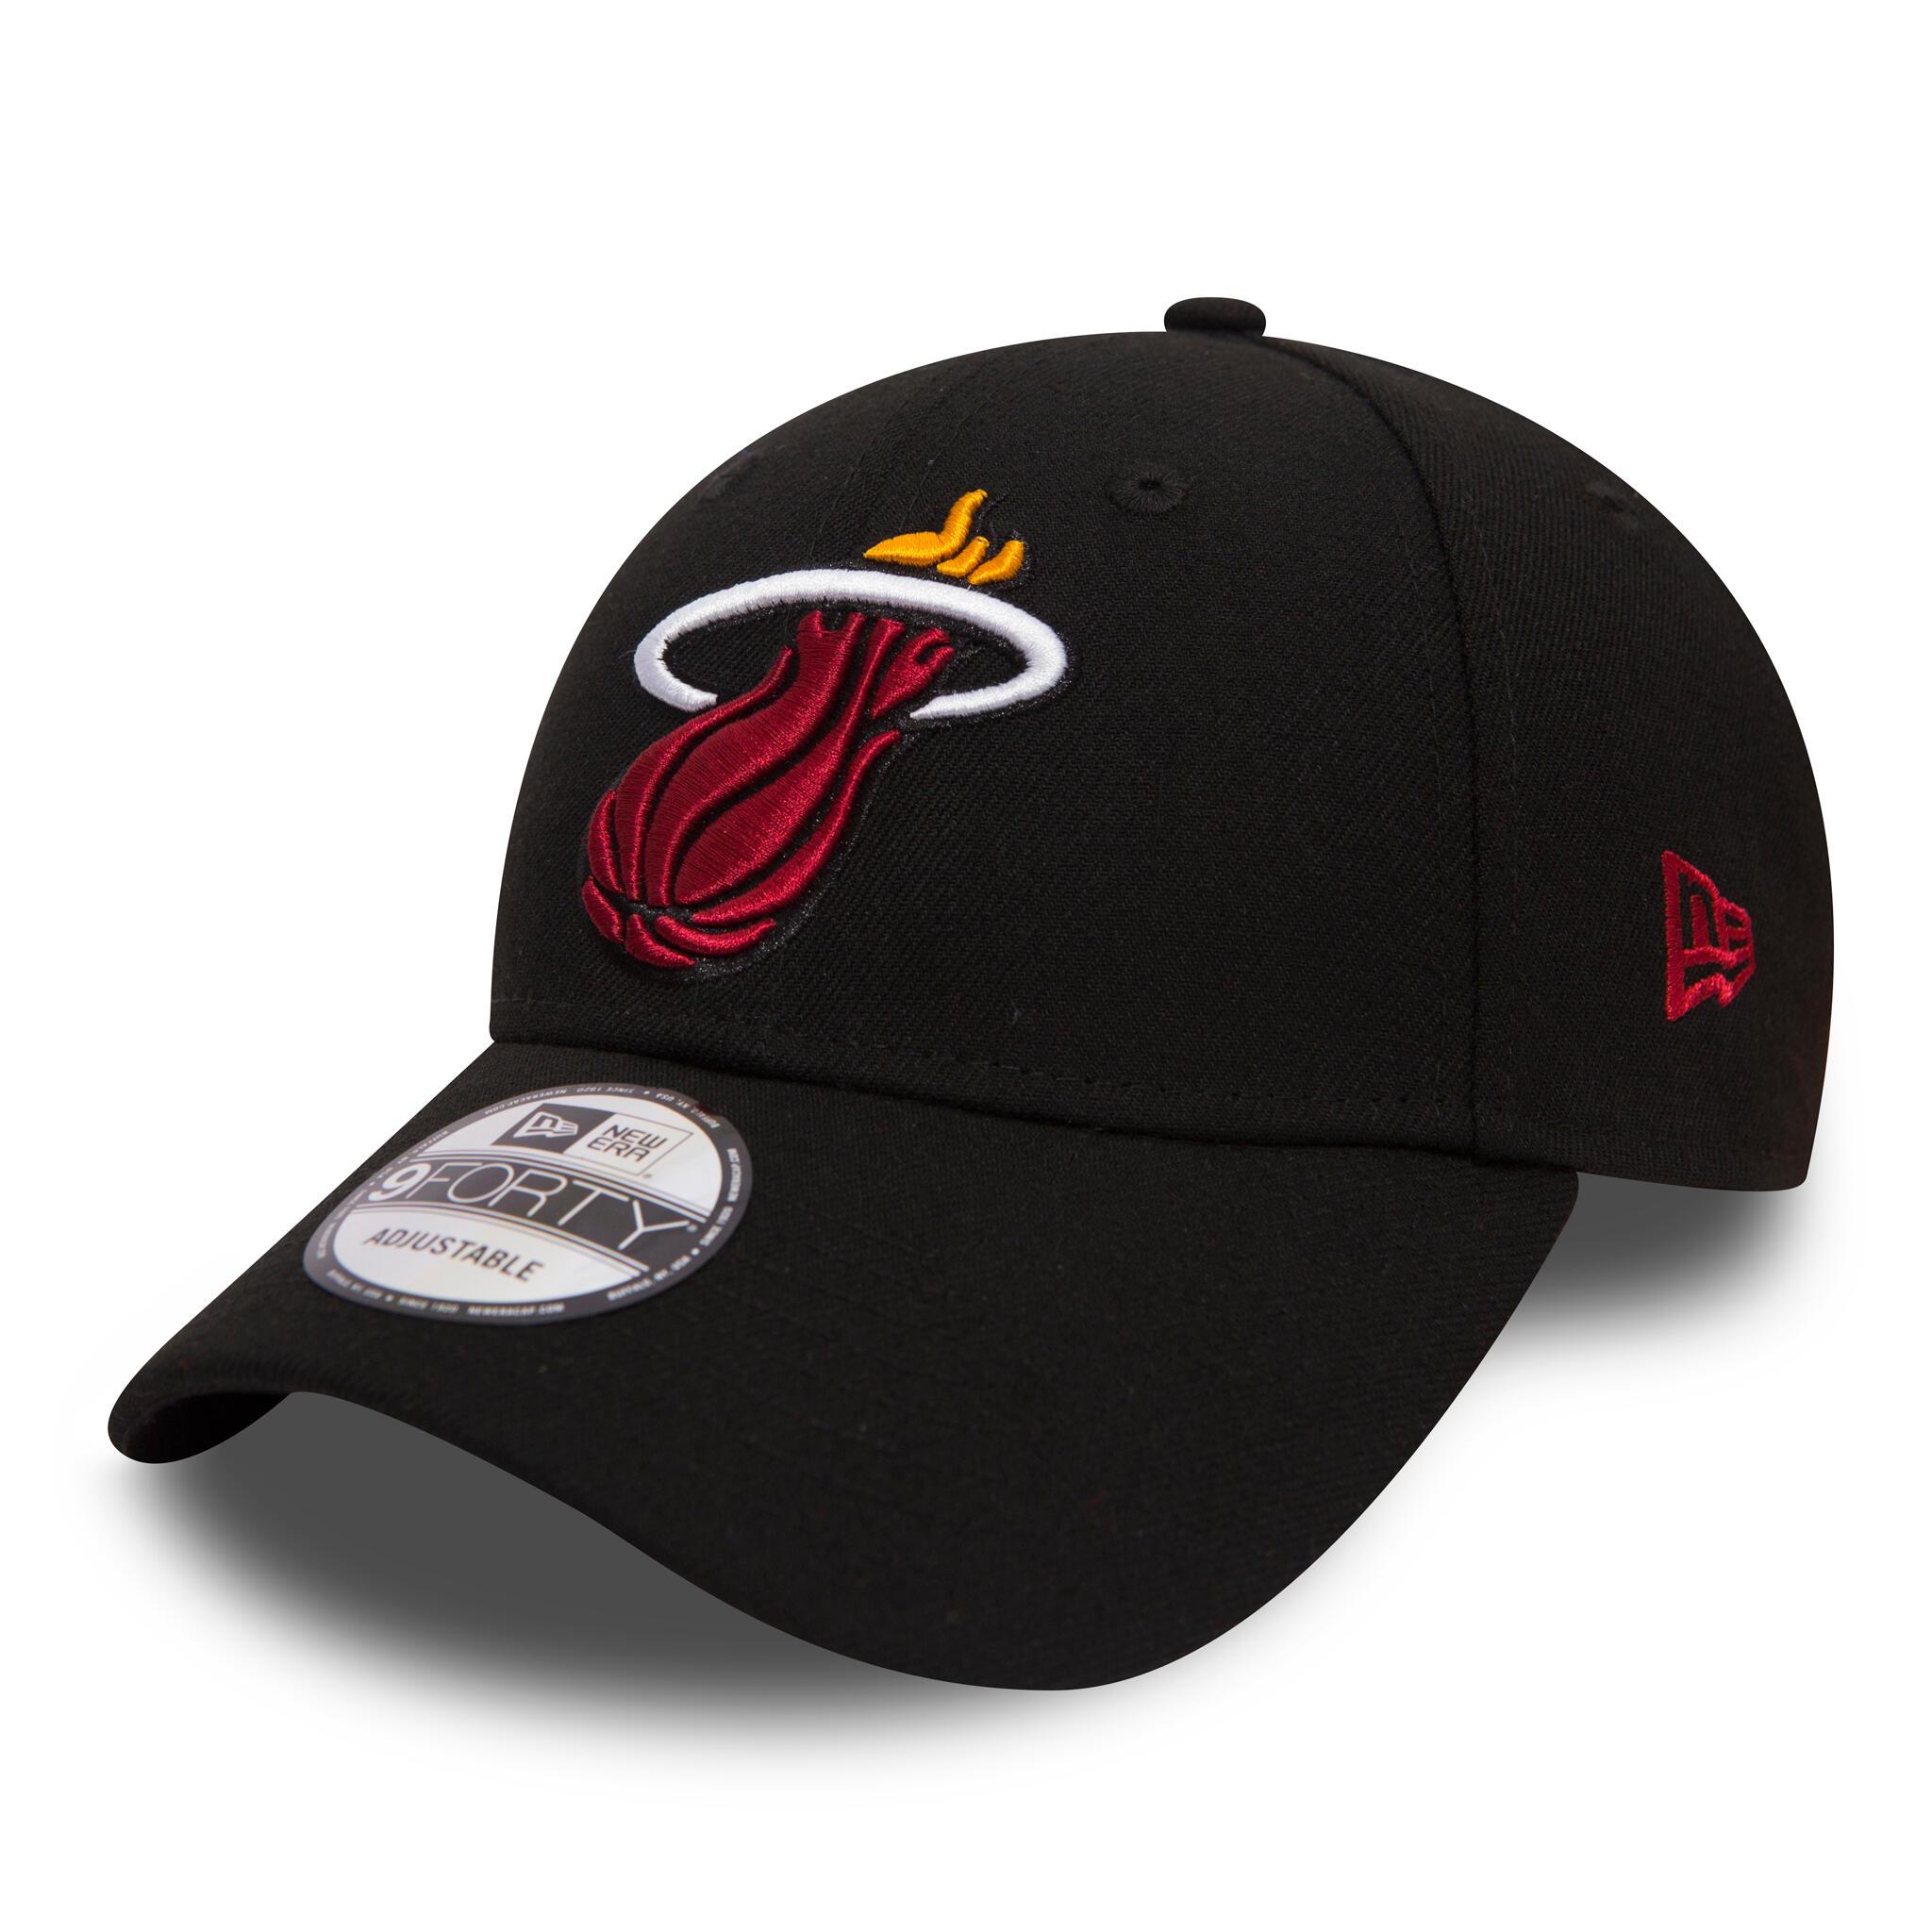 Șapcă Baschet NBA Adulți imagine